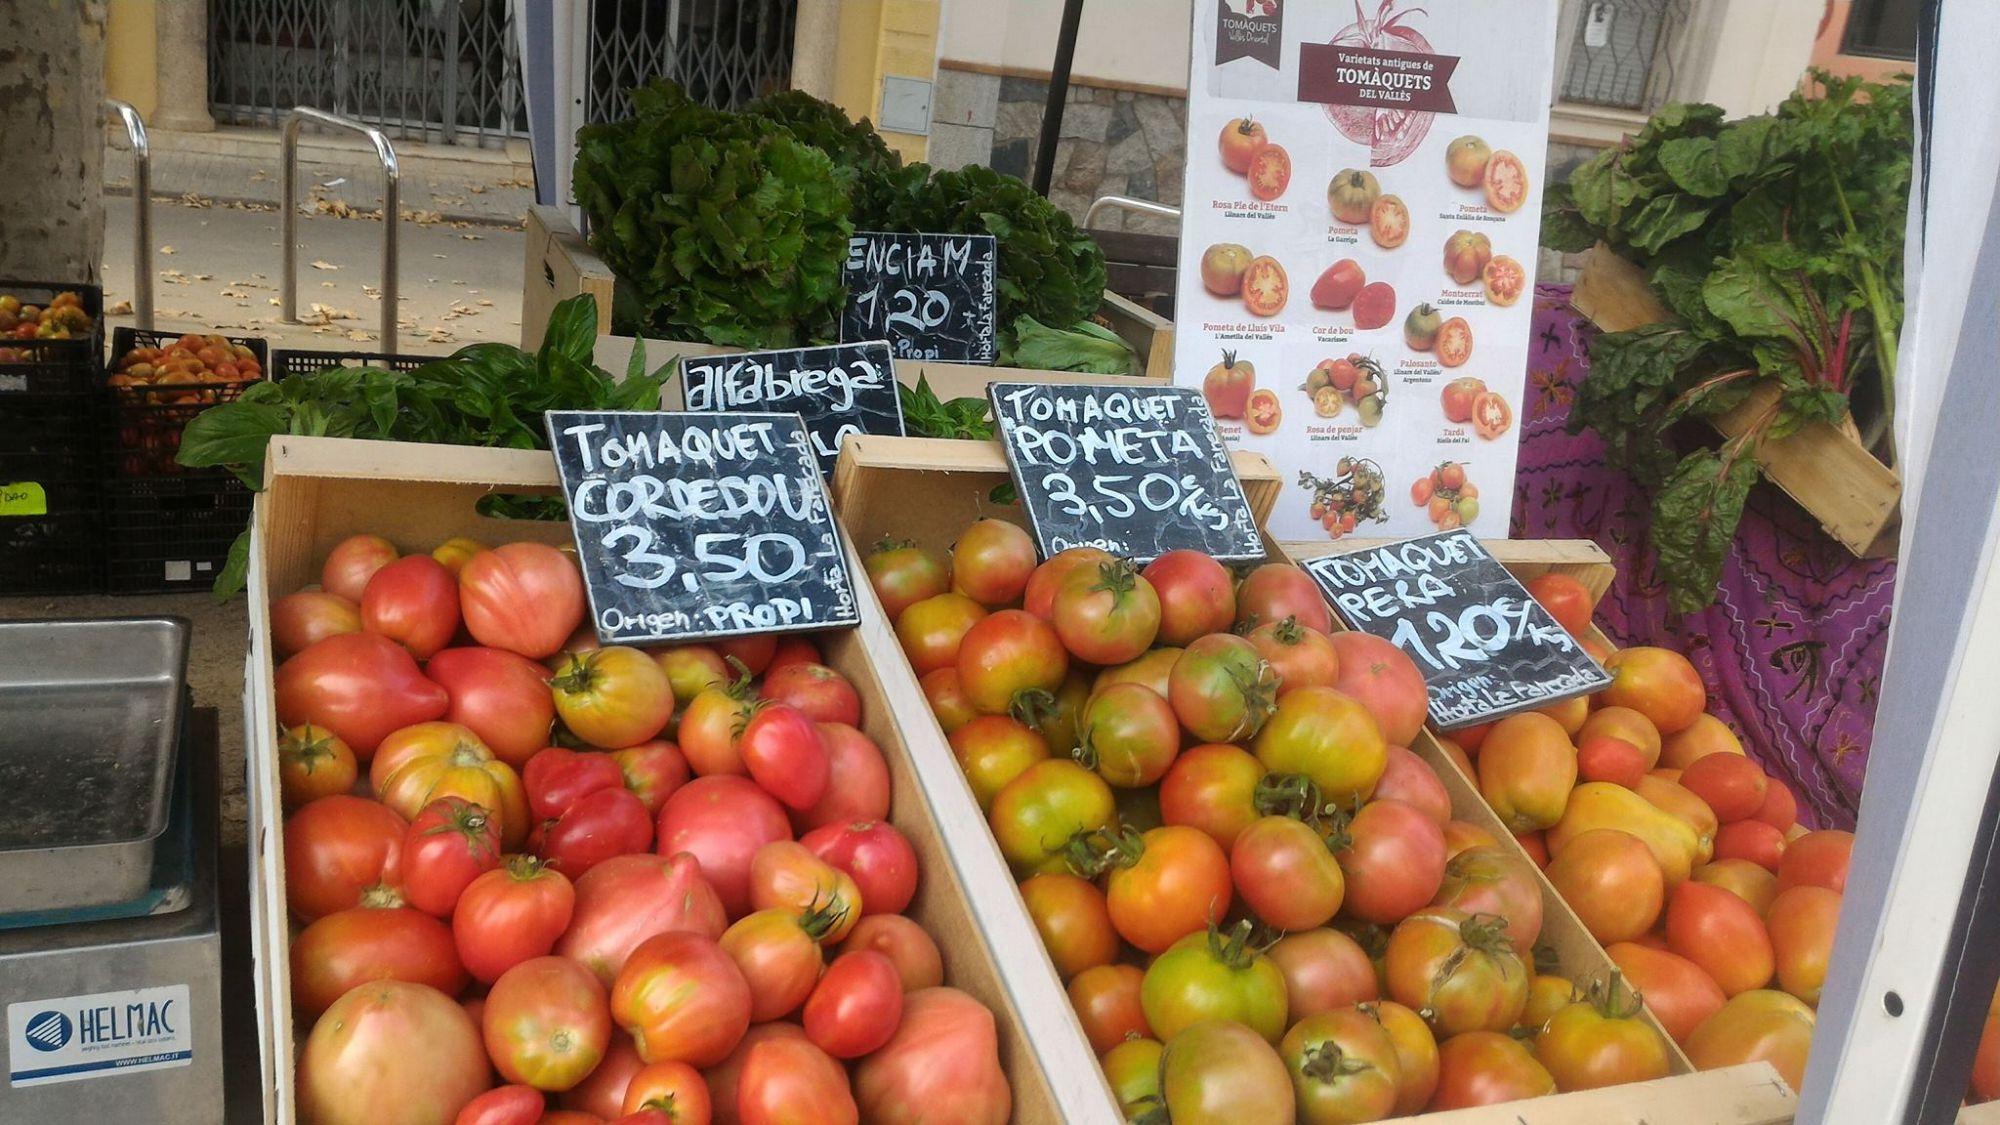 Tomates de Horta la Fanecada (Barcelona)